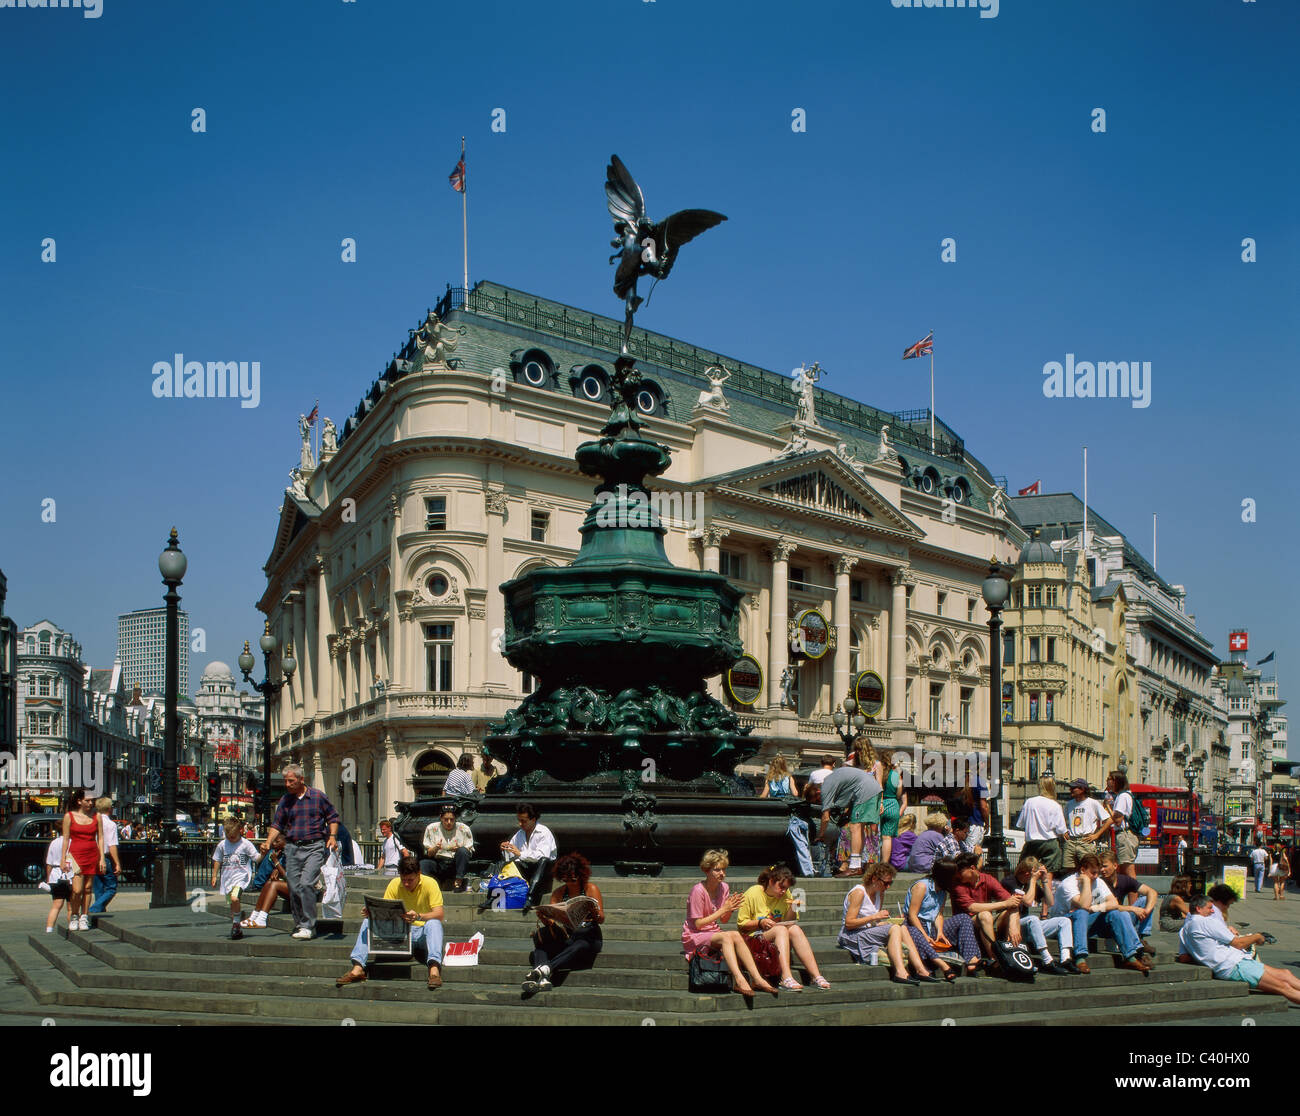 England, United Kingdom, Great Britain, Eros, Europe, Holiday, Landmark, London, People, Piccadilly circus, Statue, - Stock Image